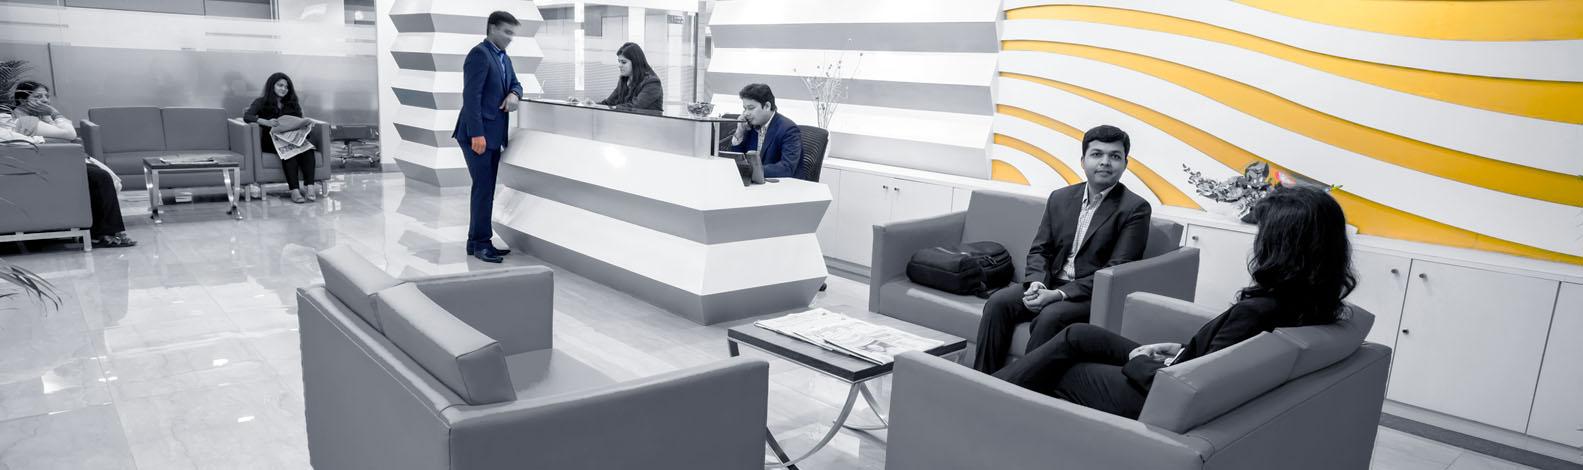 service office gurgoan